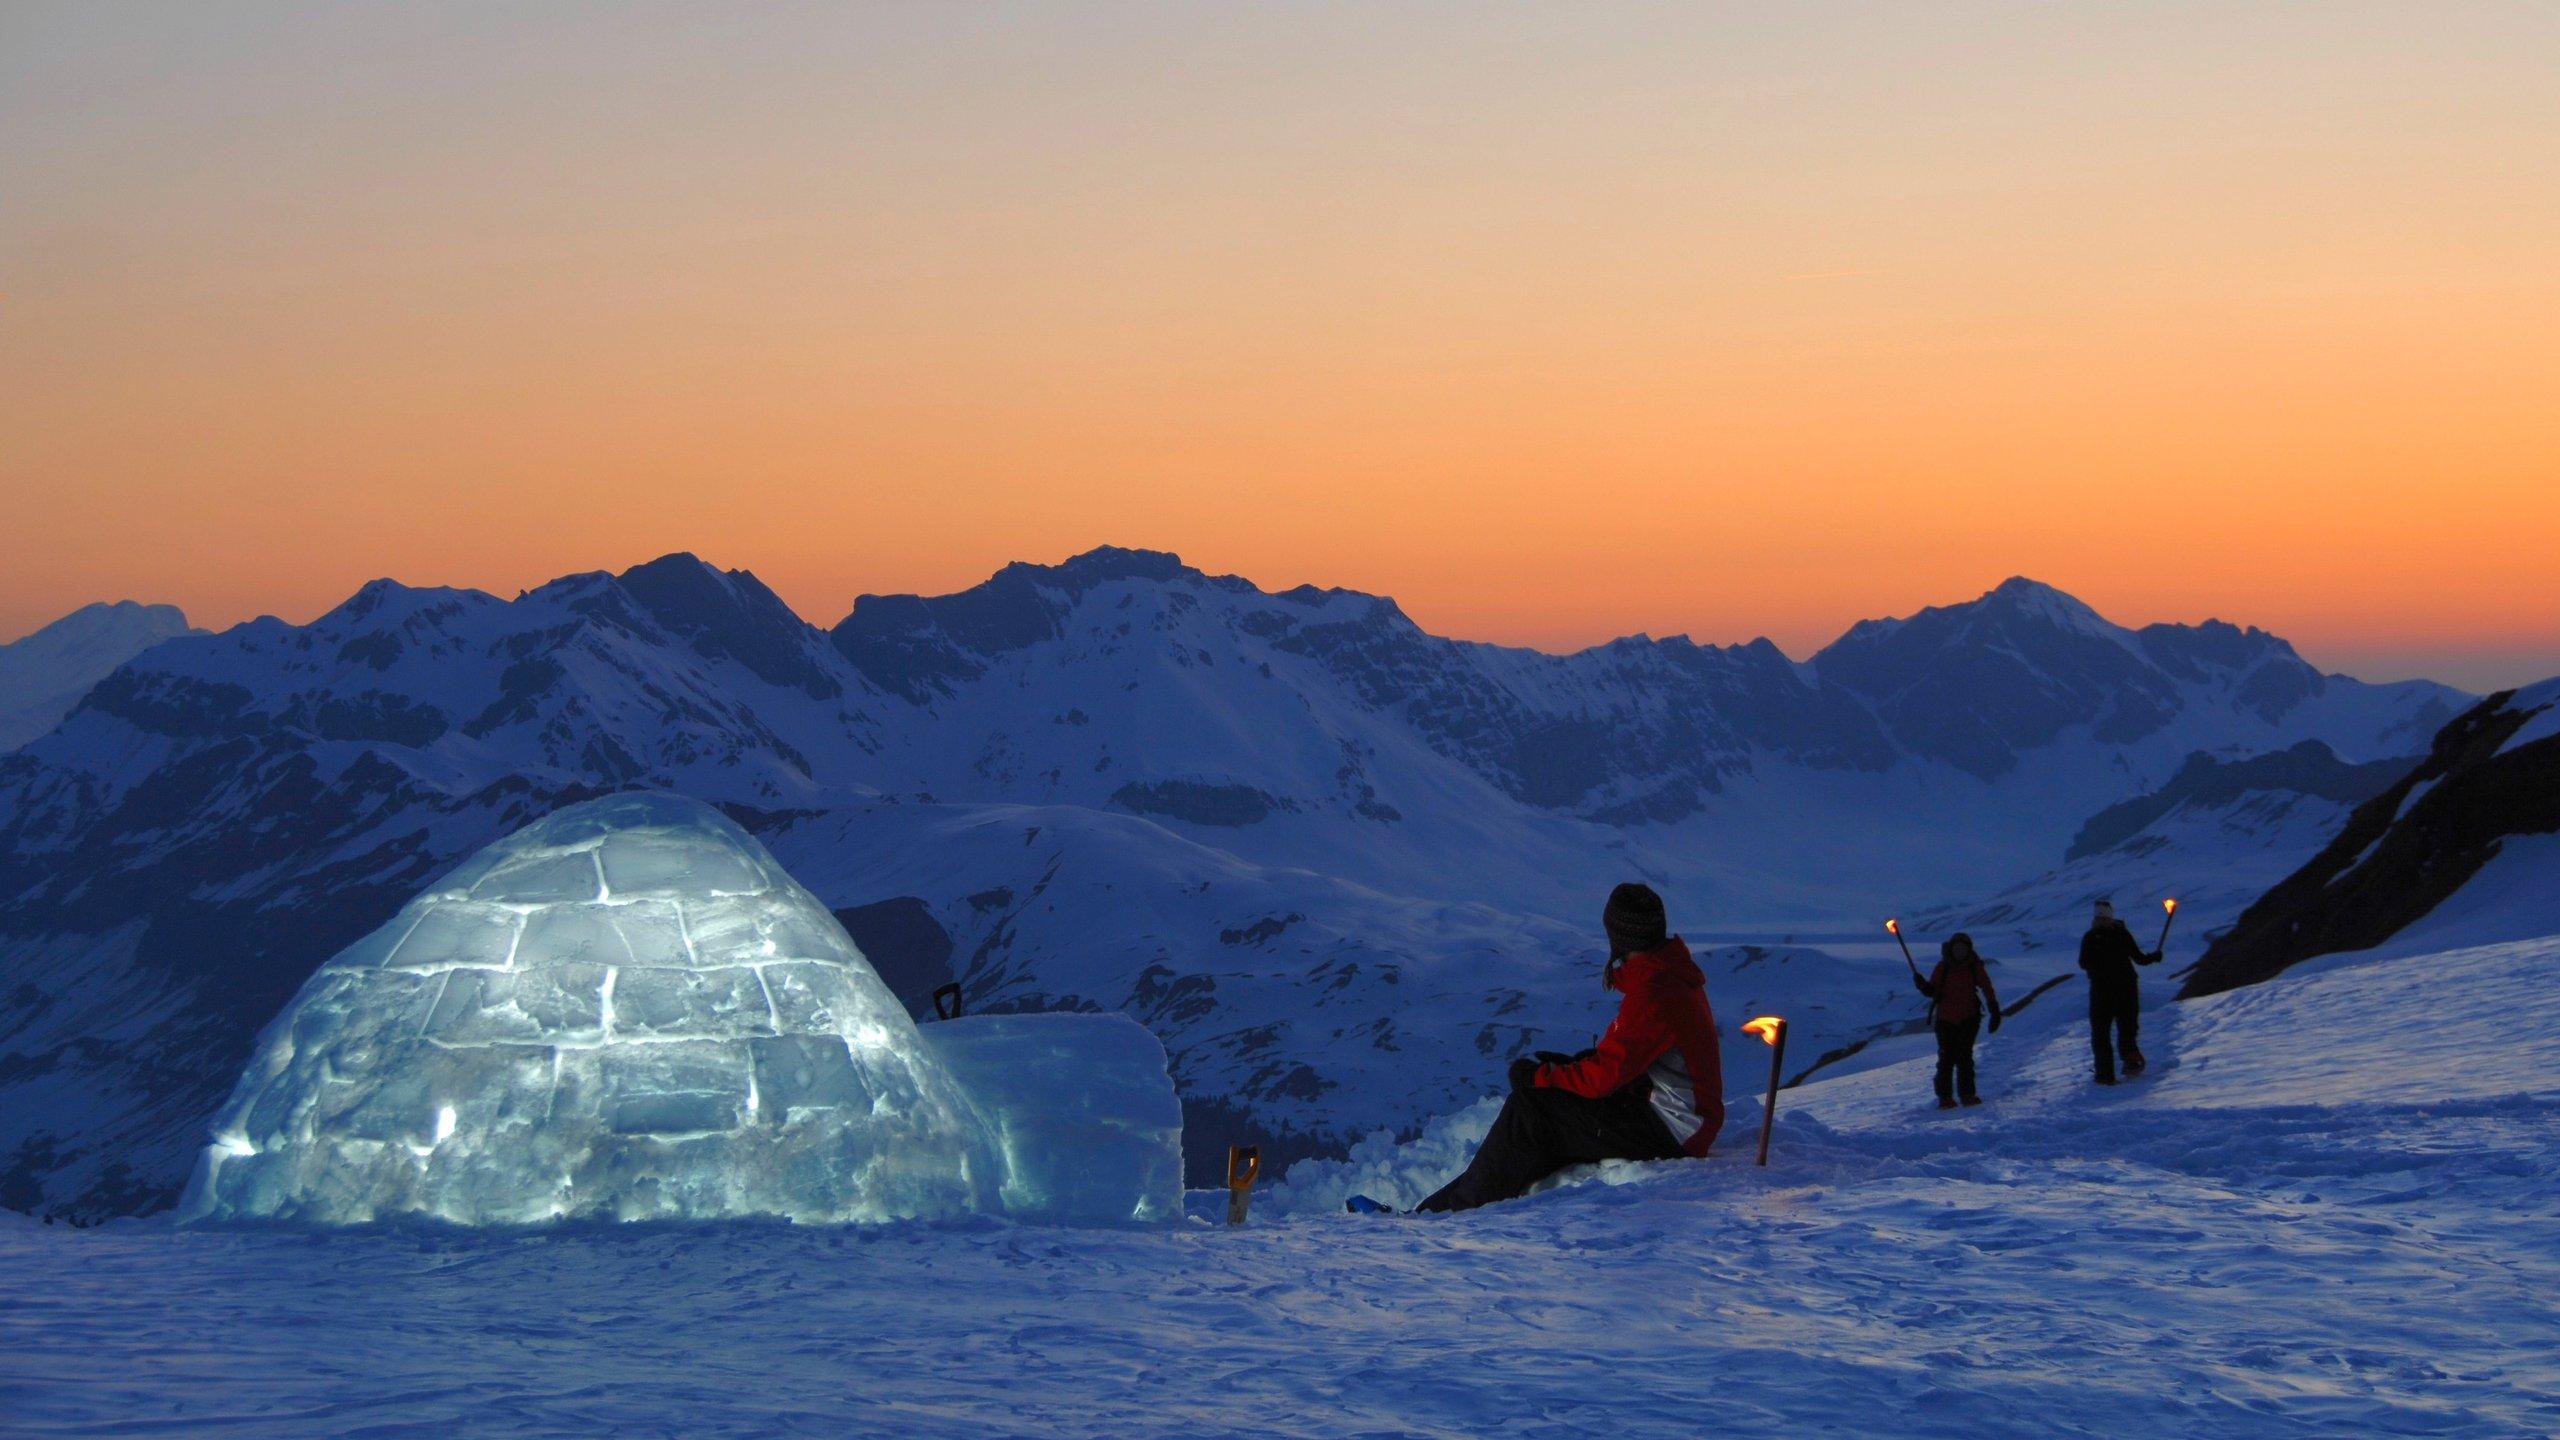 Engelberg-Titlis Ski Resort, Engelberg, Canton of Obwalden, Switzerland